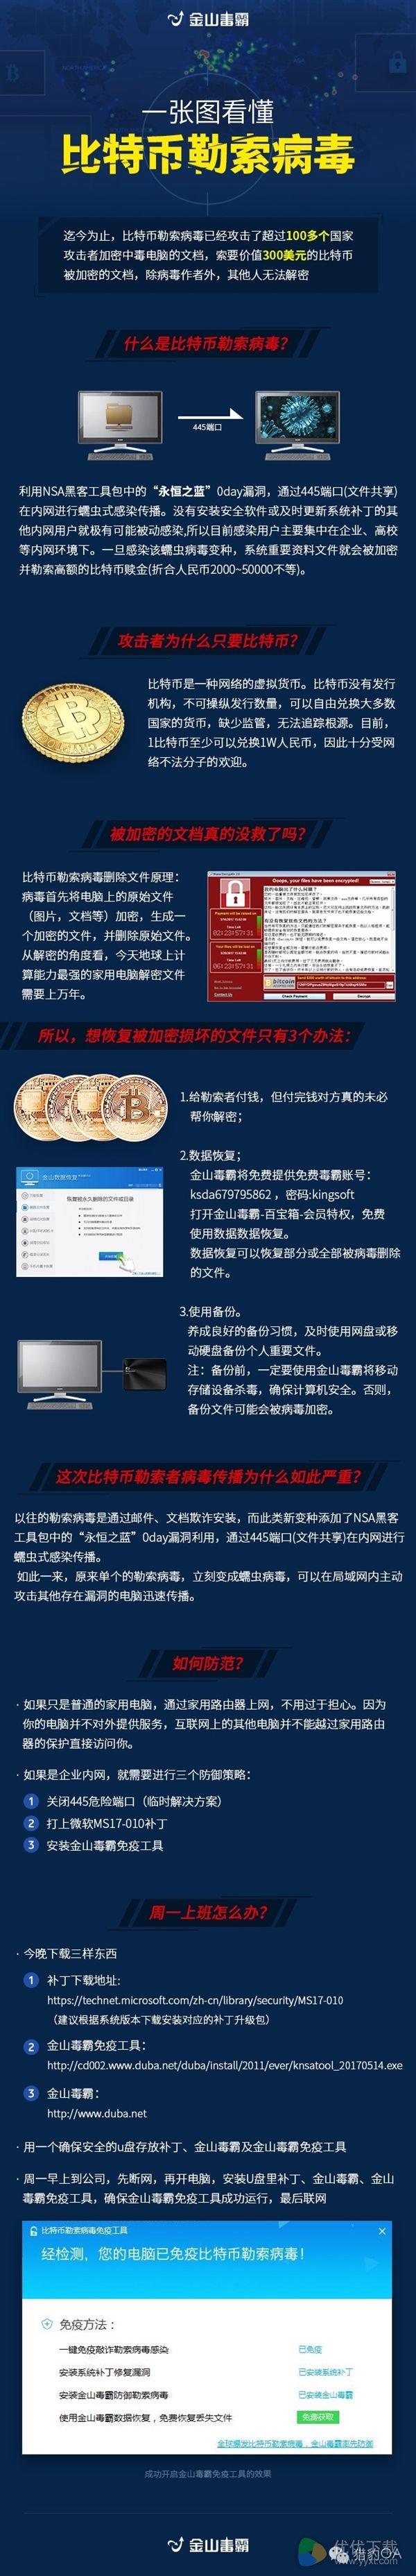 http://www.yyxt.com/pc/tech-25146.html